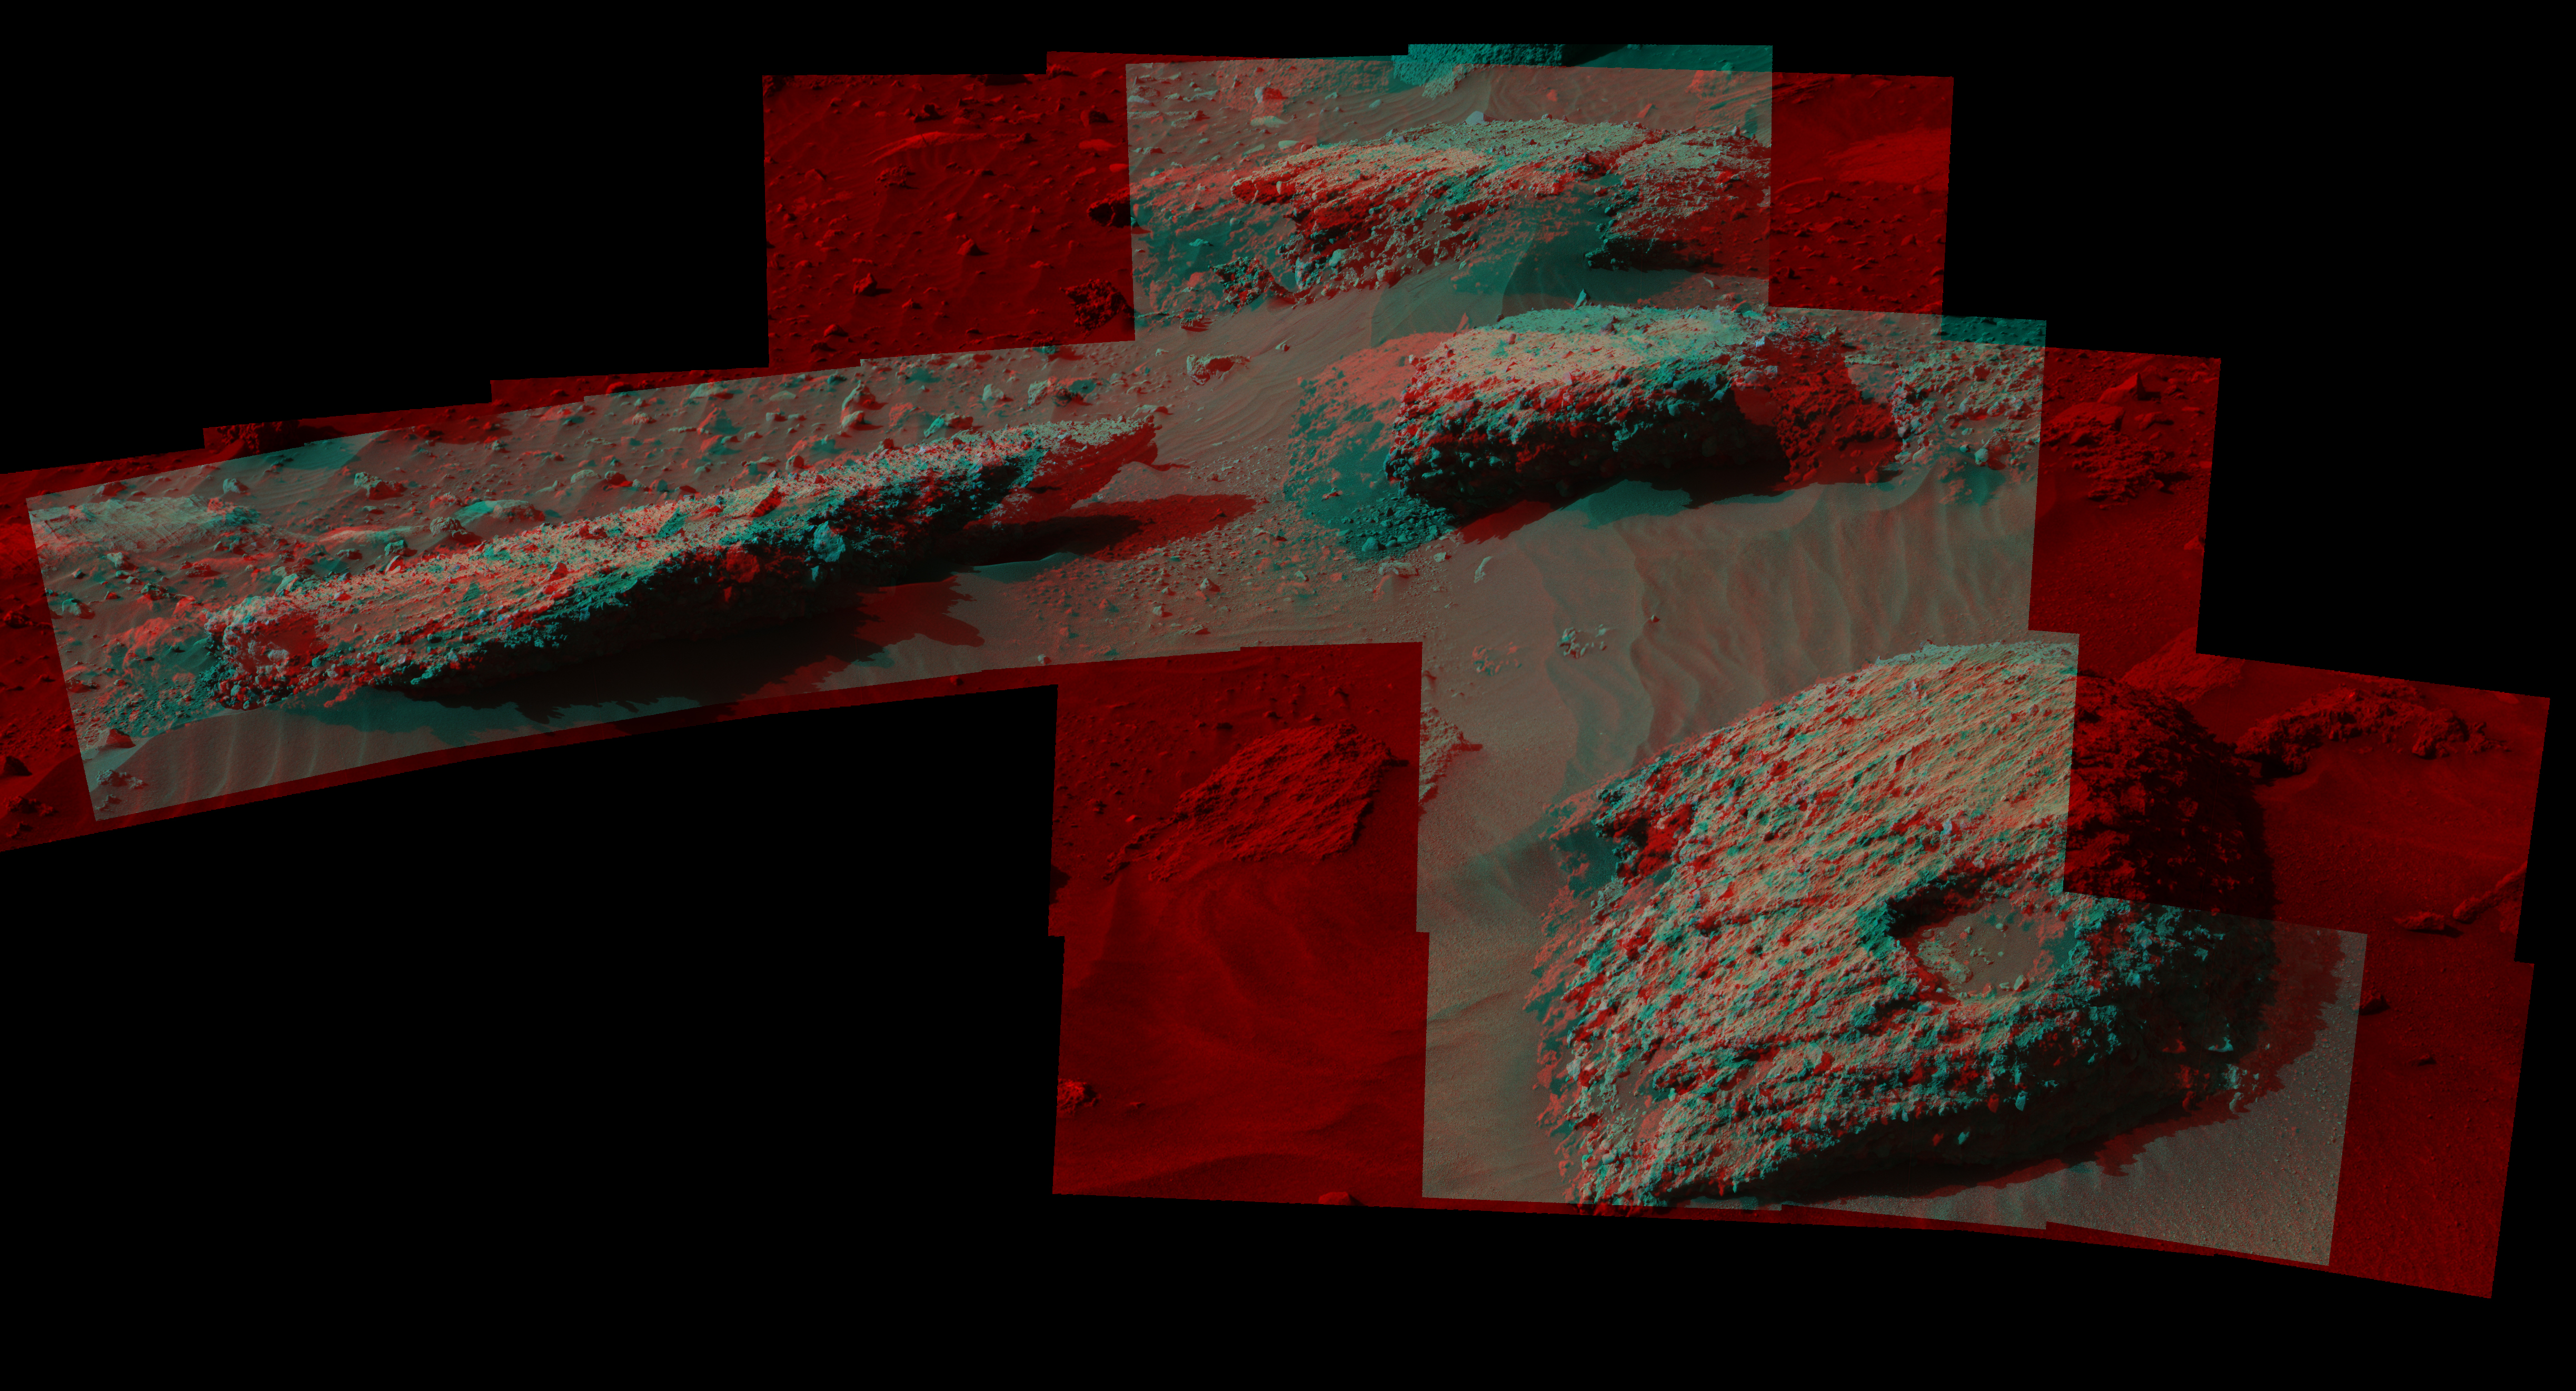 16 07 22 mars-rover-mount-sharp-boulders-PIA20836-full (1)